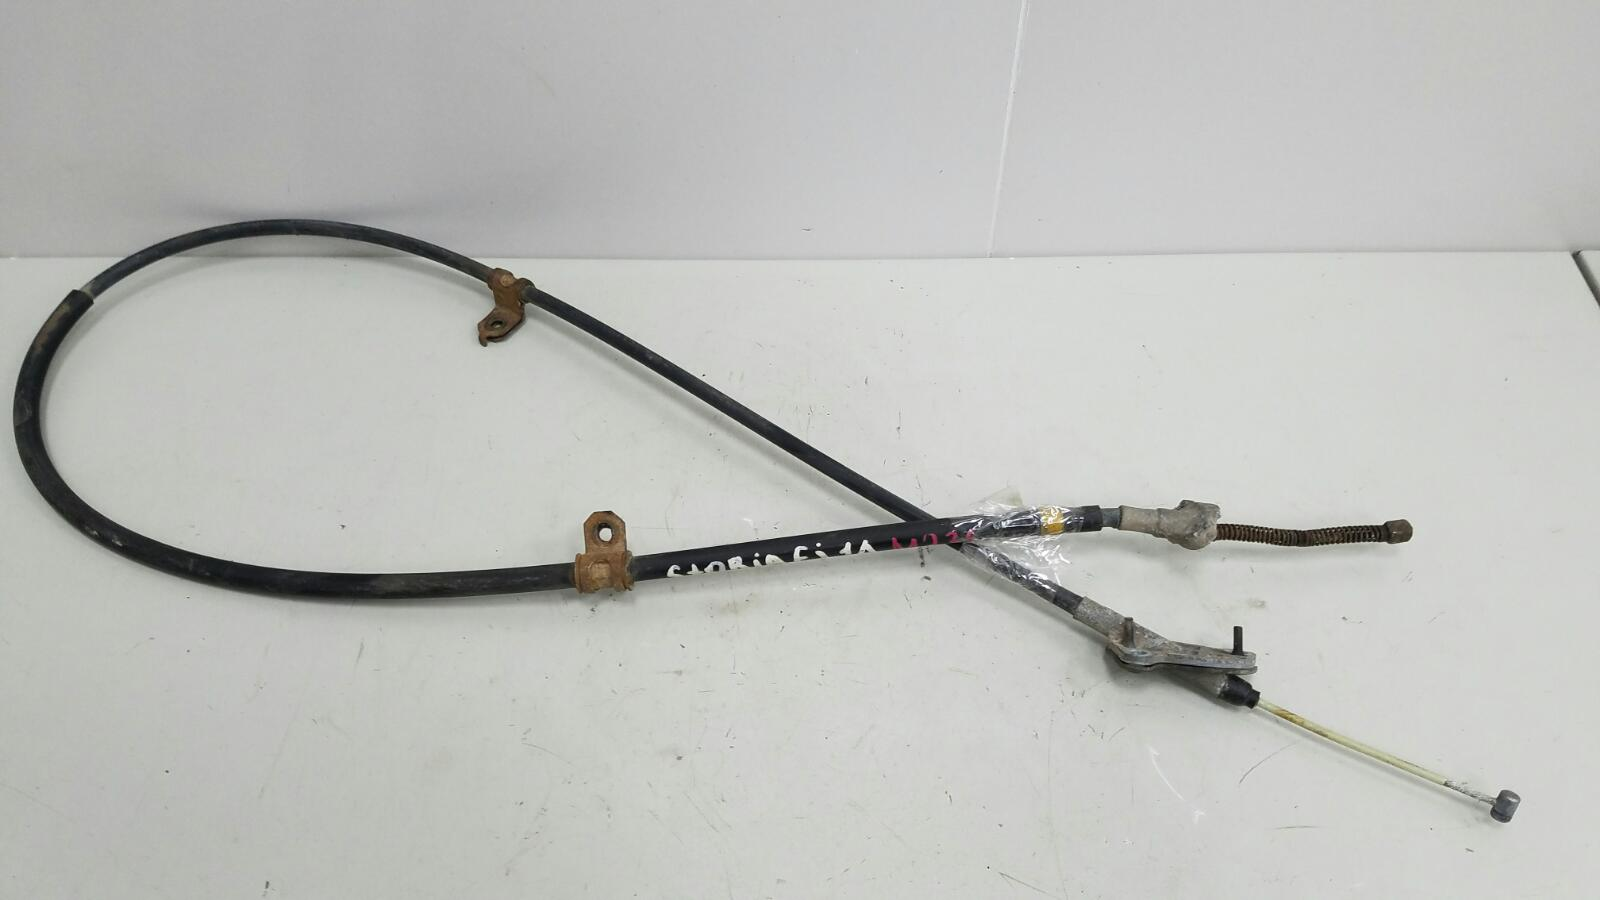 Трос ручного стояночного тормоза ручника Daihatsu Storia M100S EJ 1Л 2003